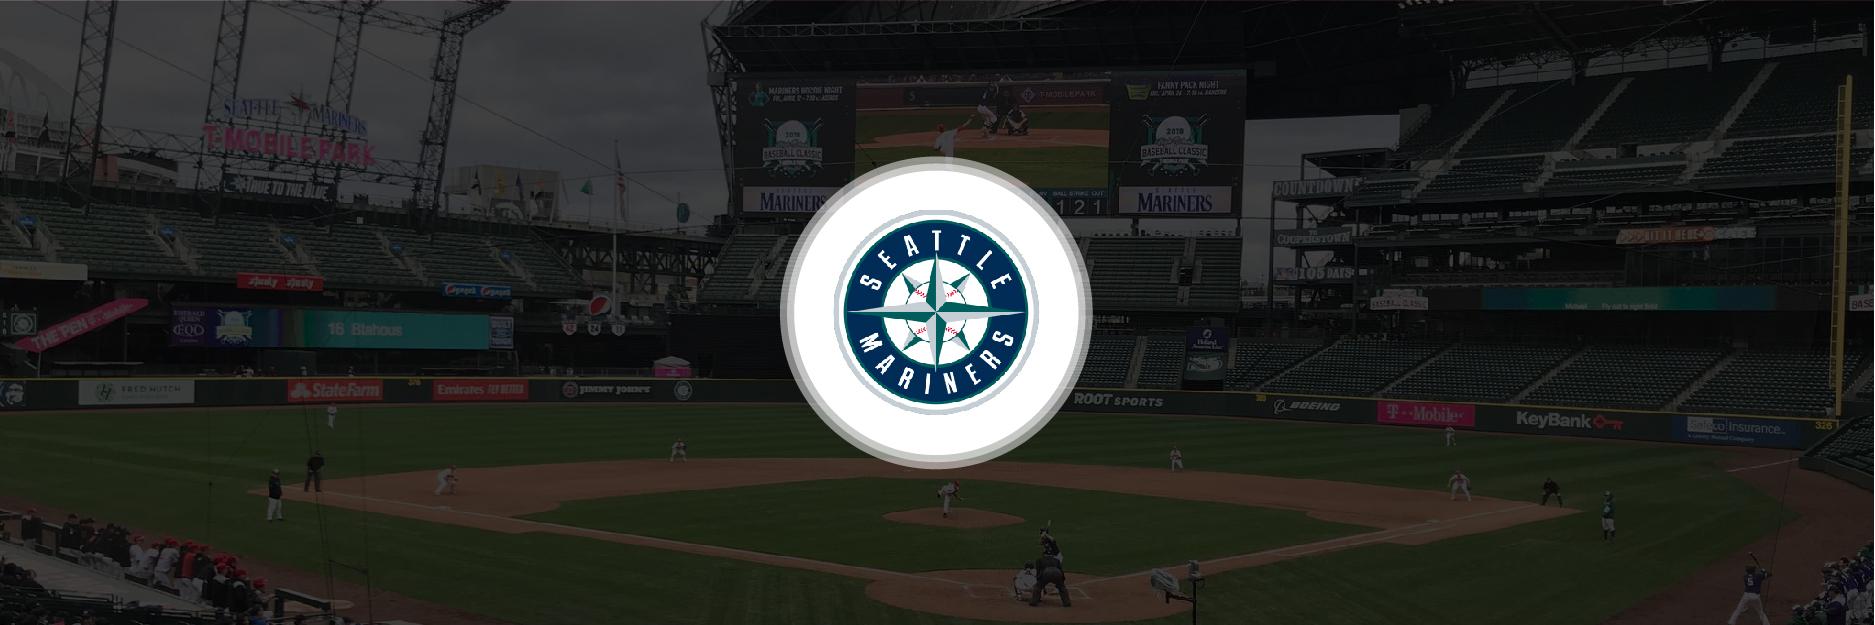 Seattle Mariners Analysis Before 2020 Season Start